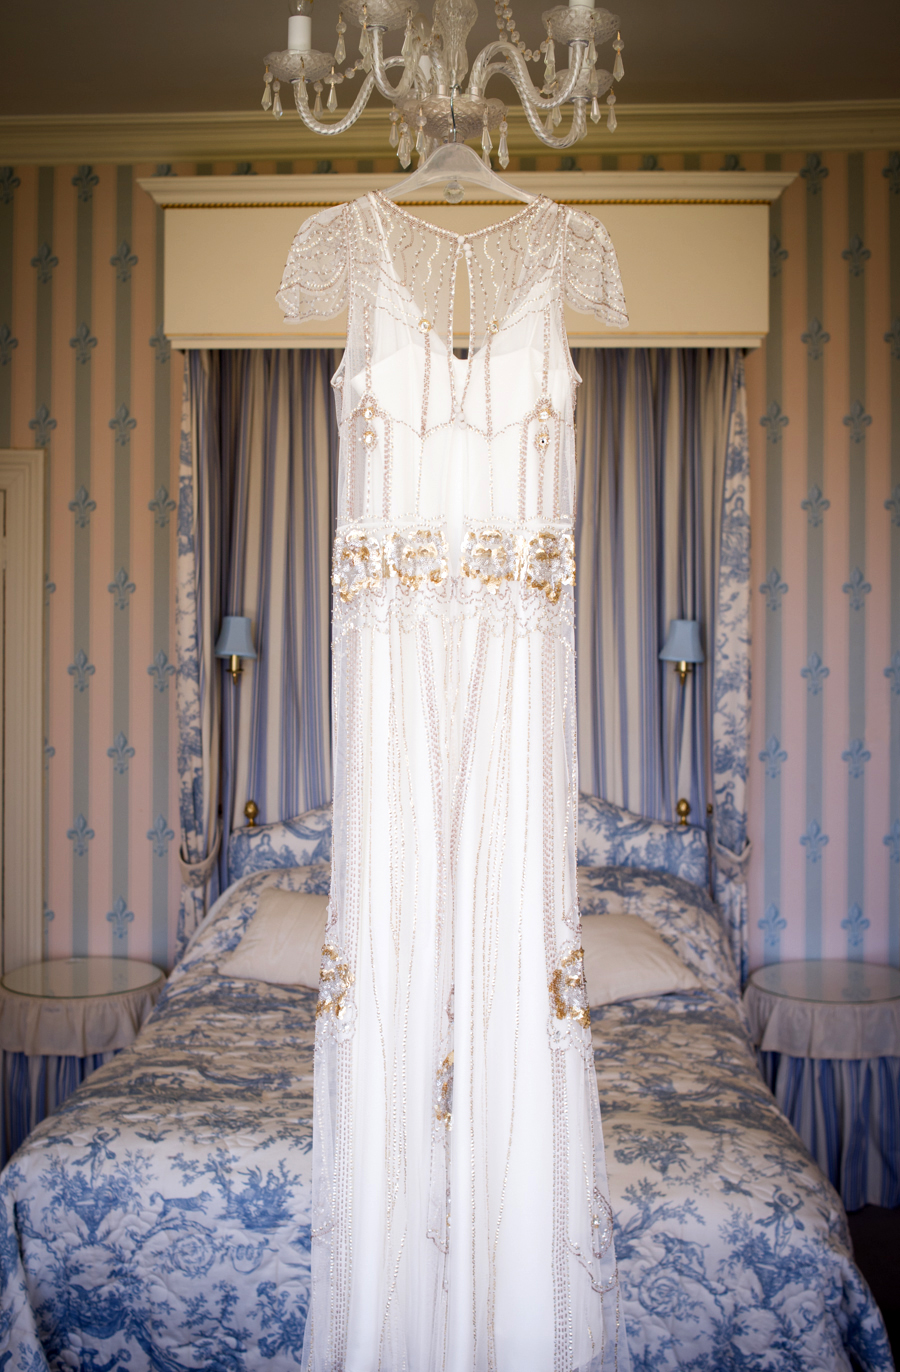 Vintage Wedding Dress 1920 S Inspired Alice In Weddingland Wedding Blog